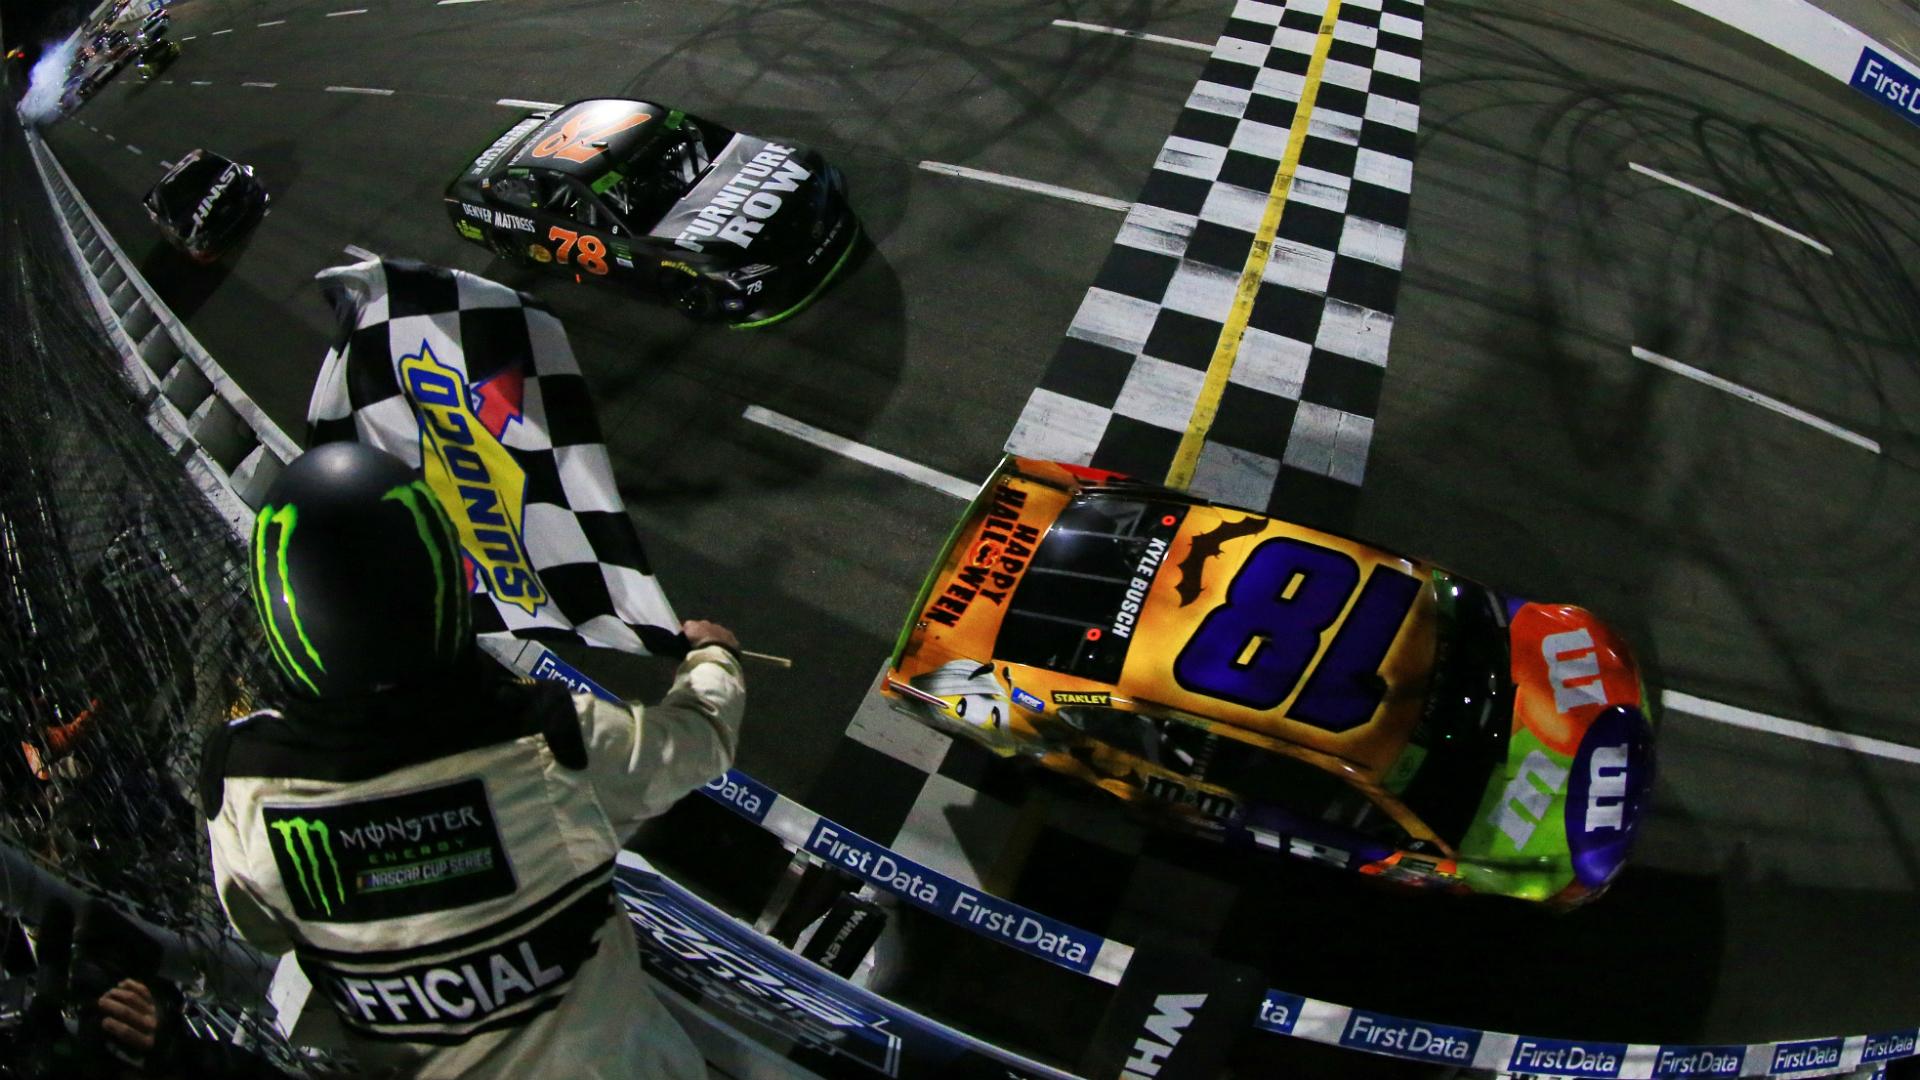 f9f16c64b591 2018 NASCAR All-Star Race odds